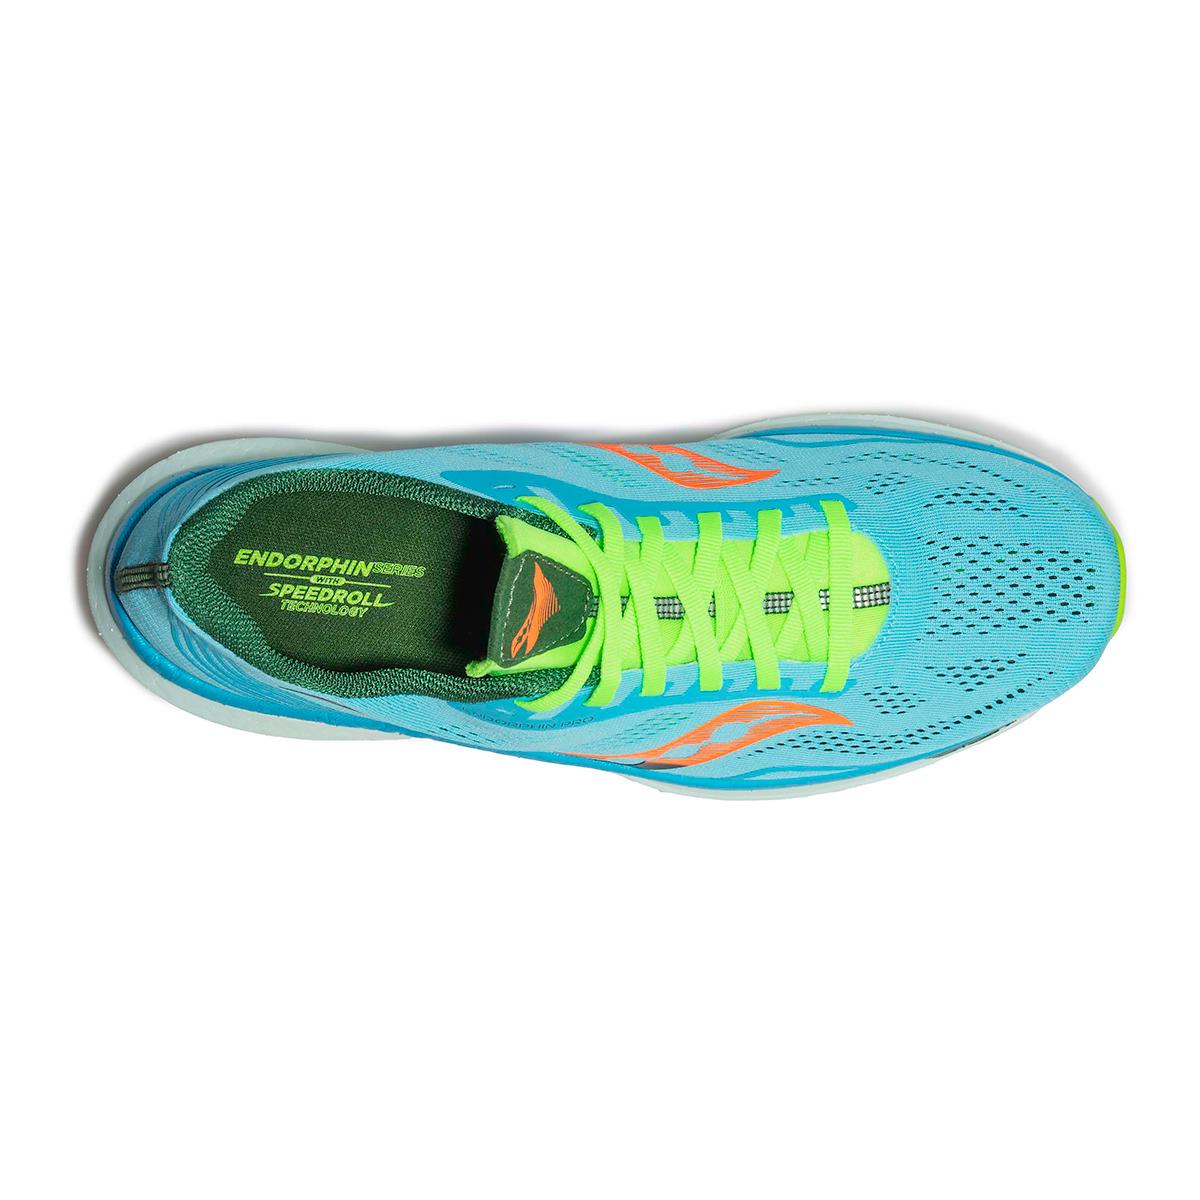 Men's Saucony Endorphin Pro Running Shoe - Color: Future/Blue - Size: 7 - Width: Regular, Future/Blue, large, image 3